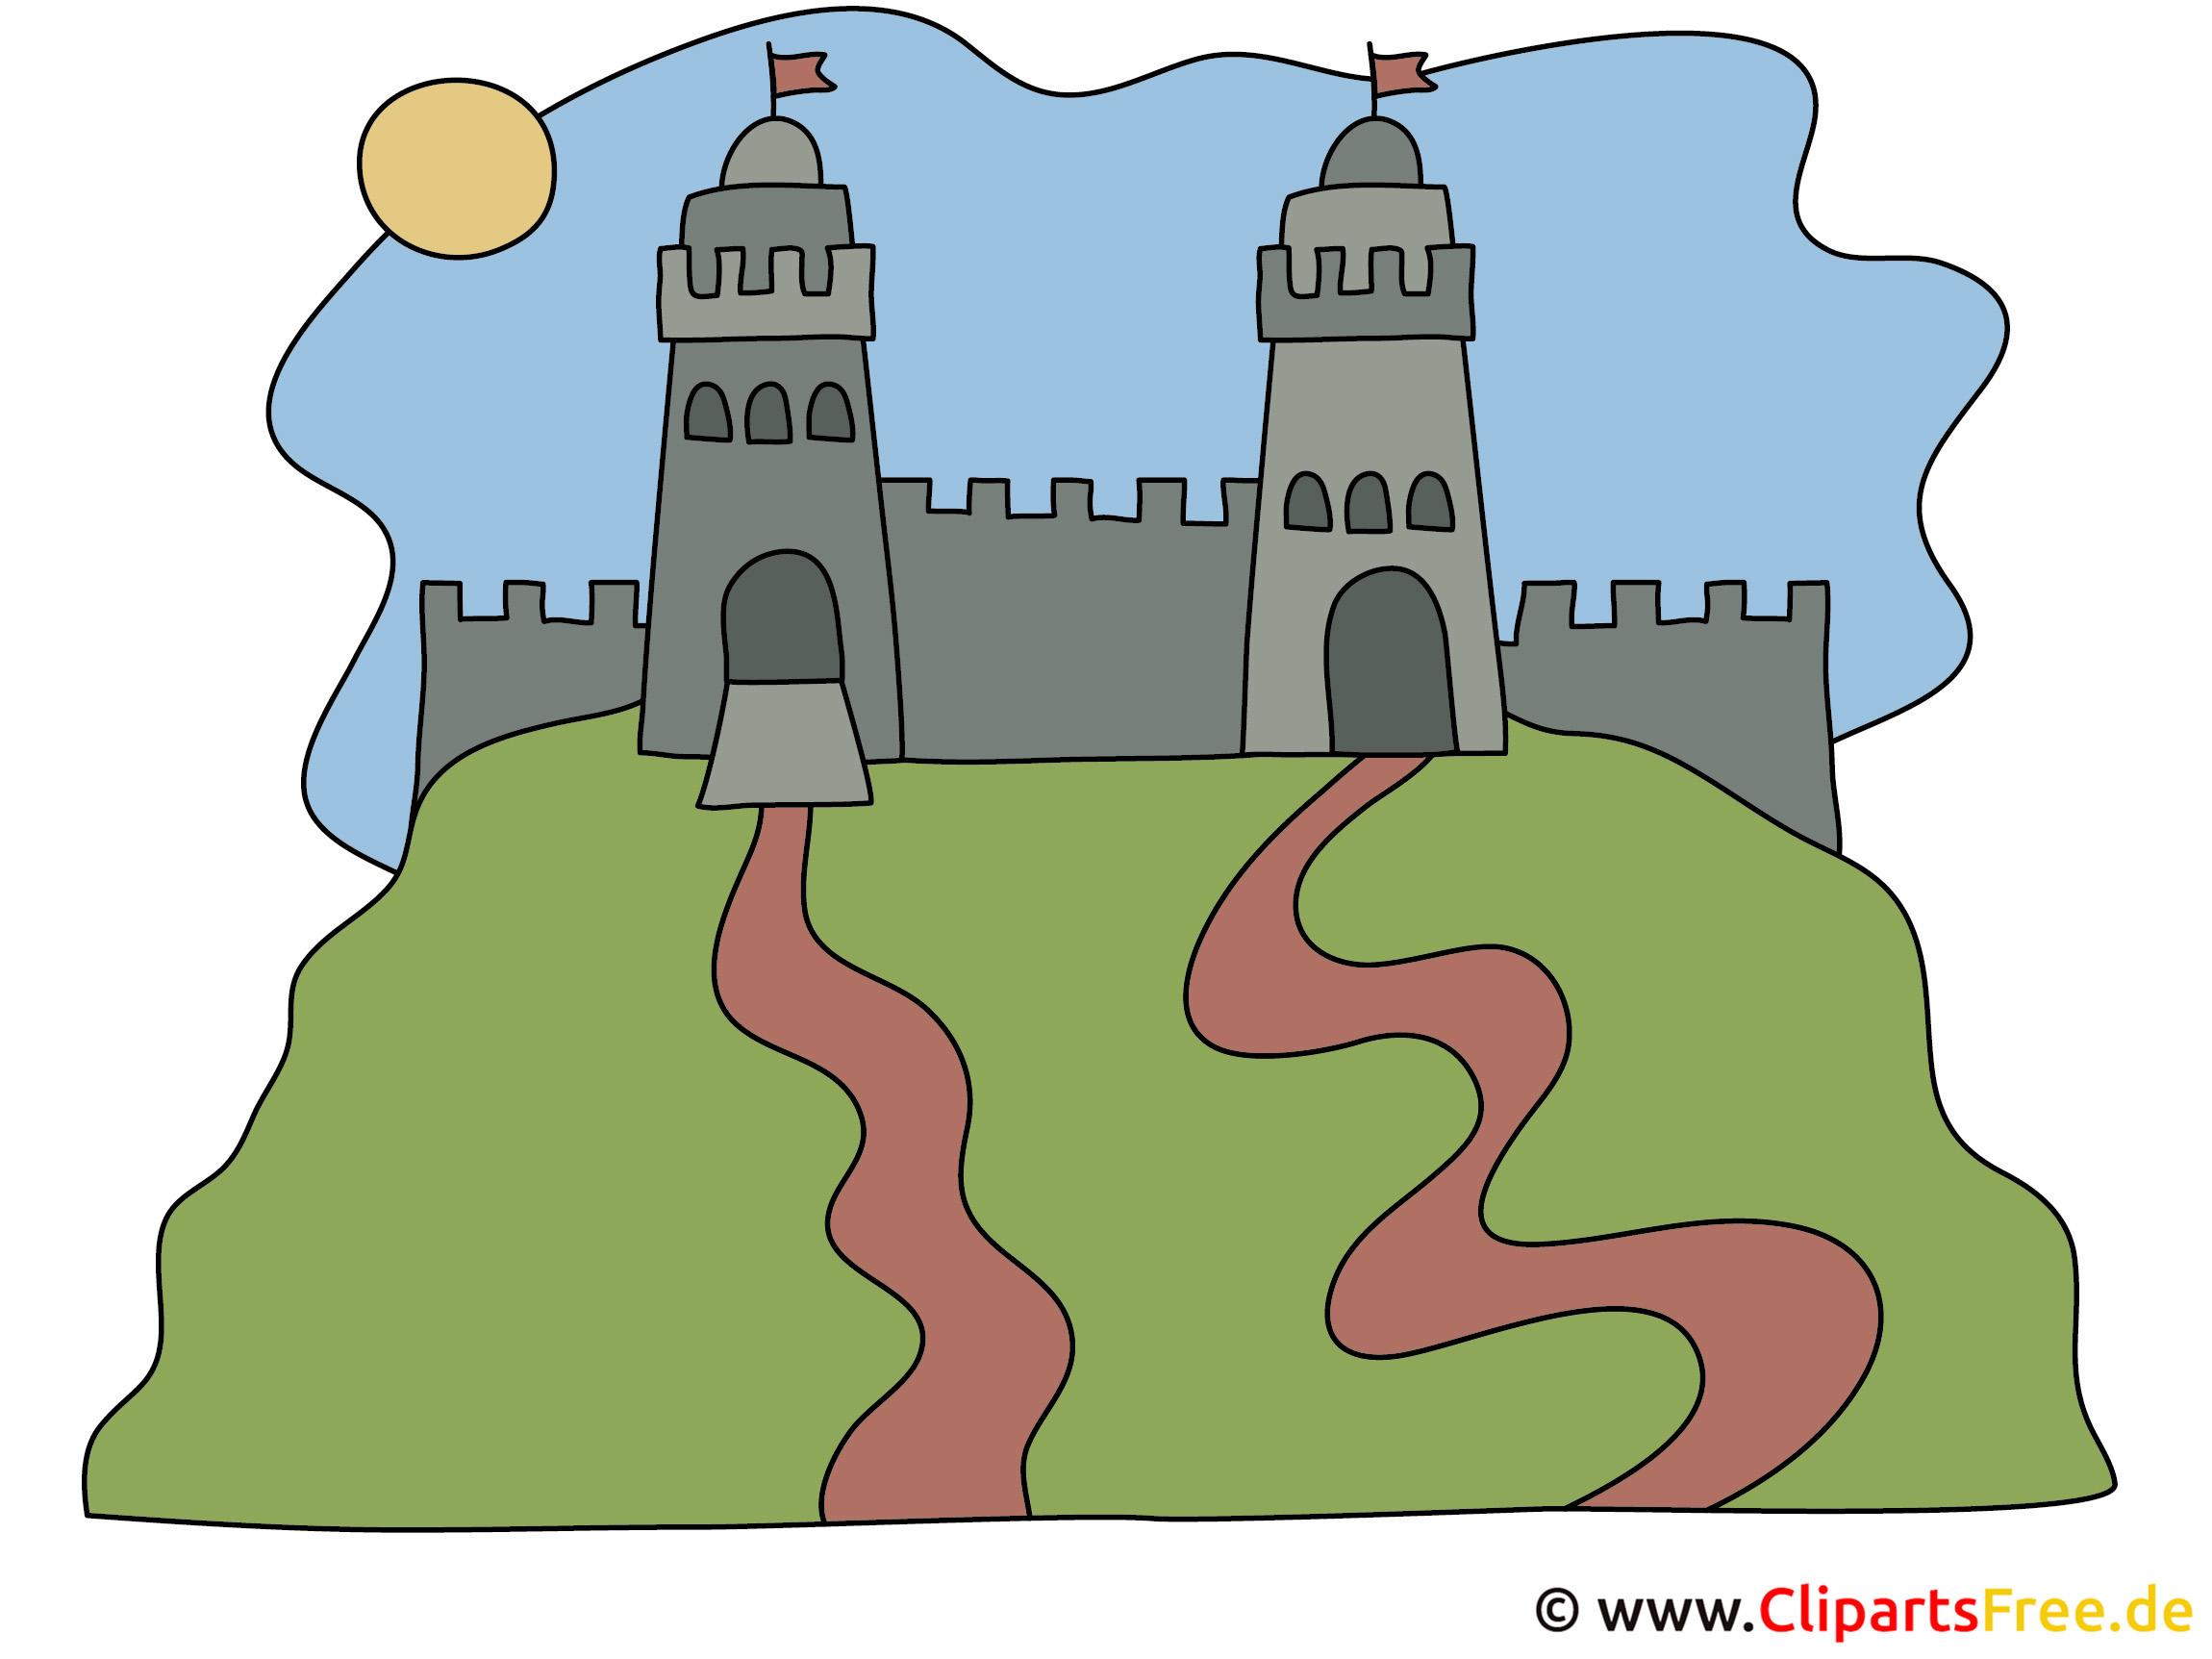 Burg auf dem Hügel Bild